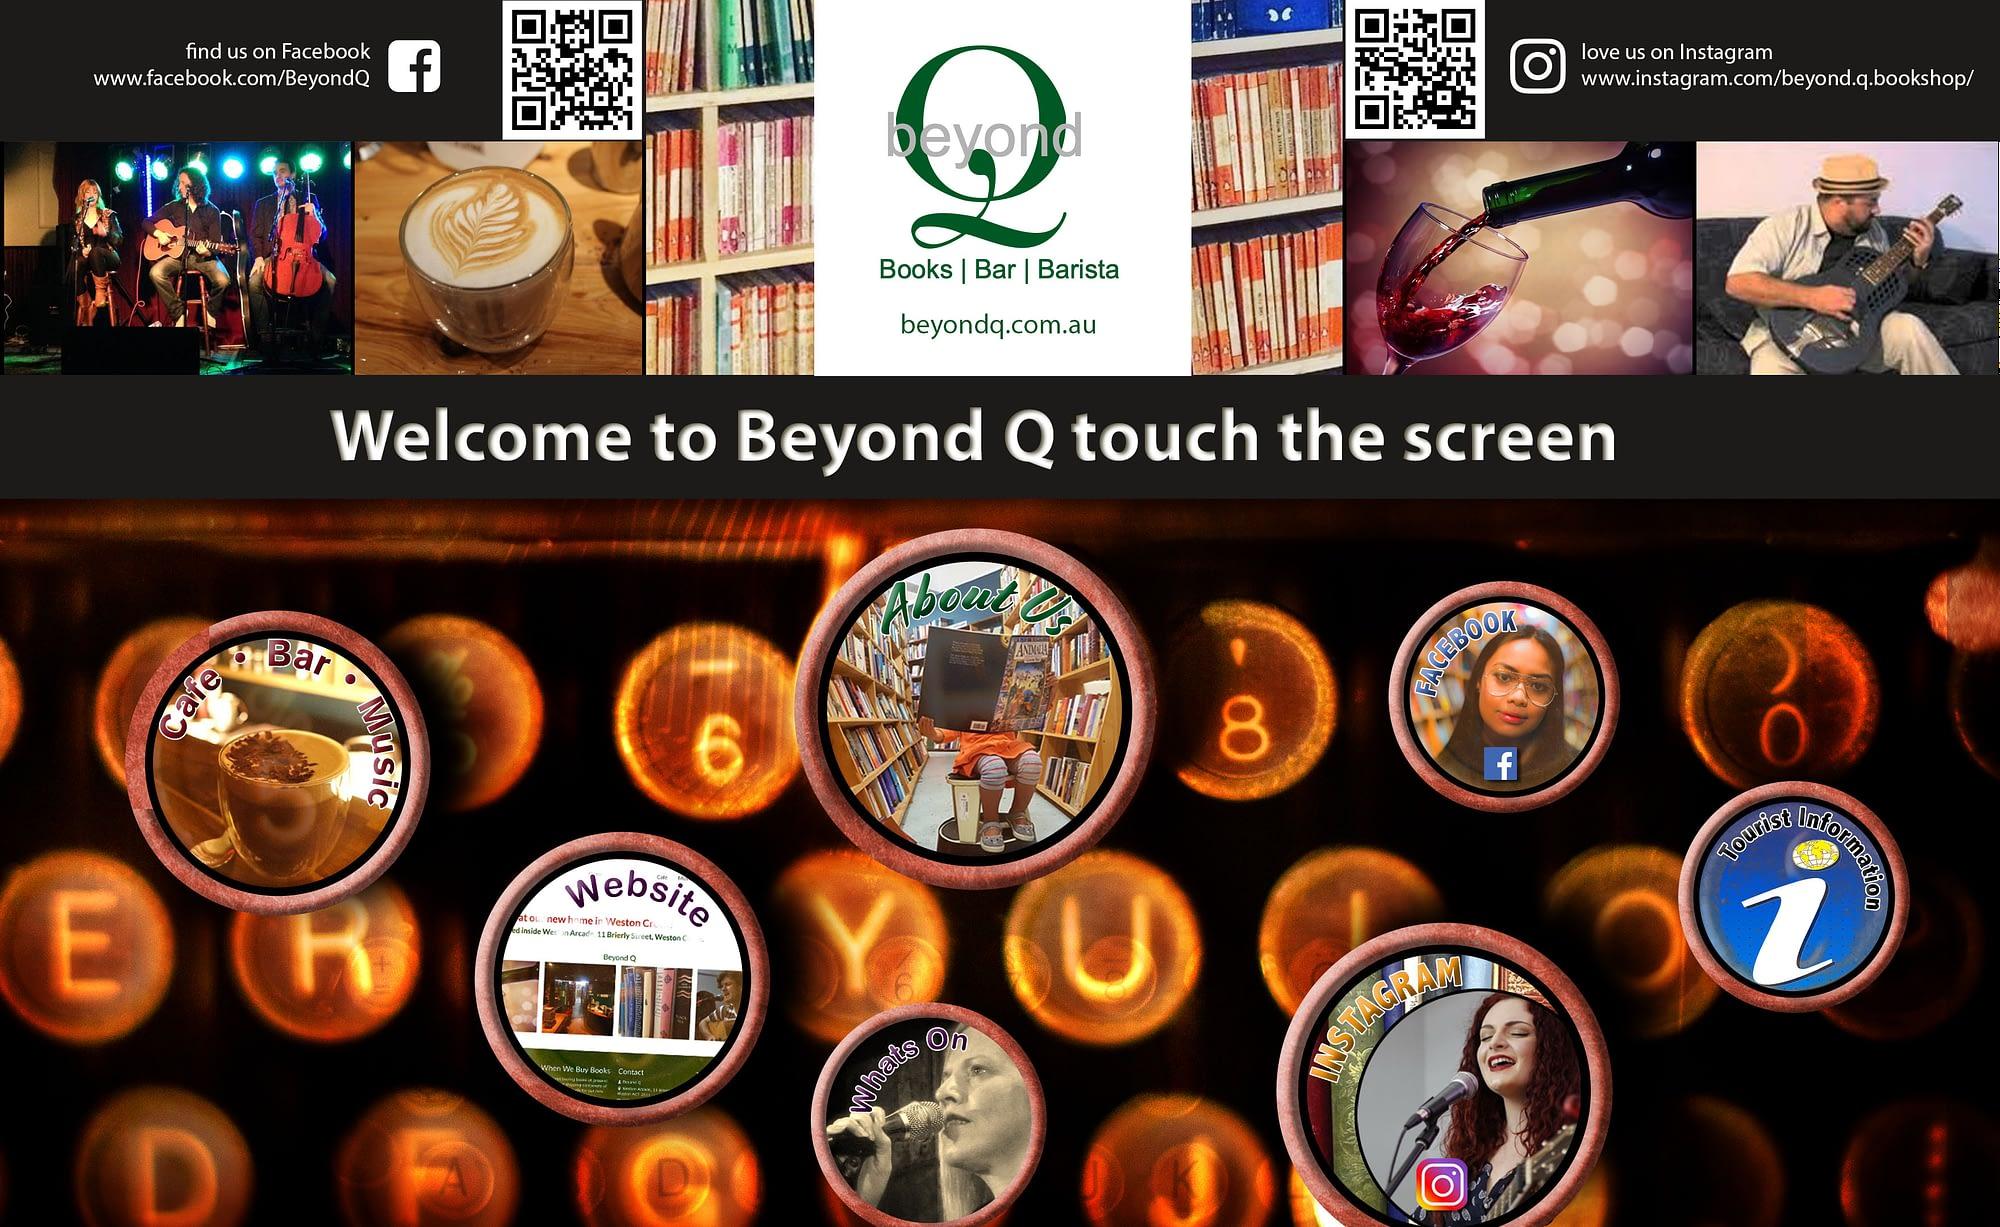 Beyond Q Cafe Touchscreen